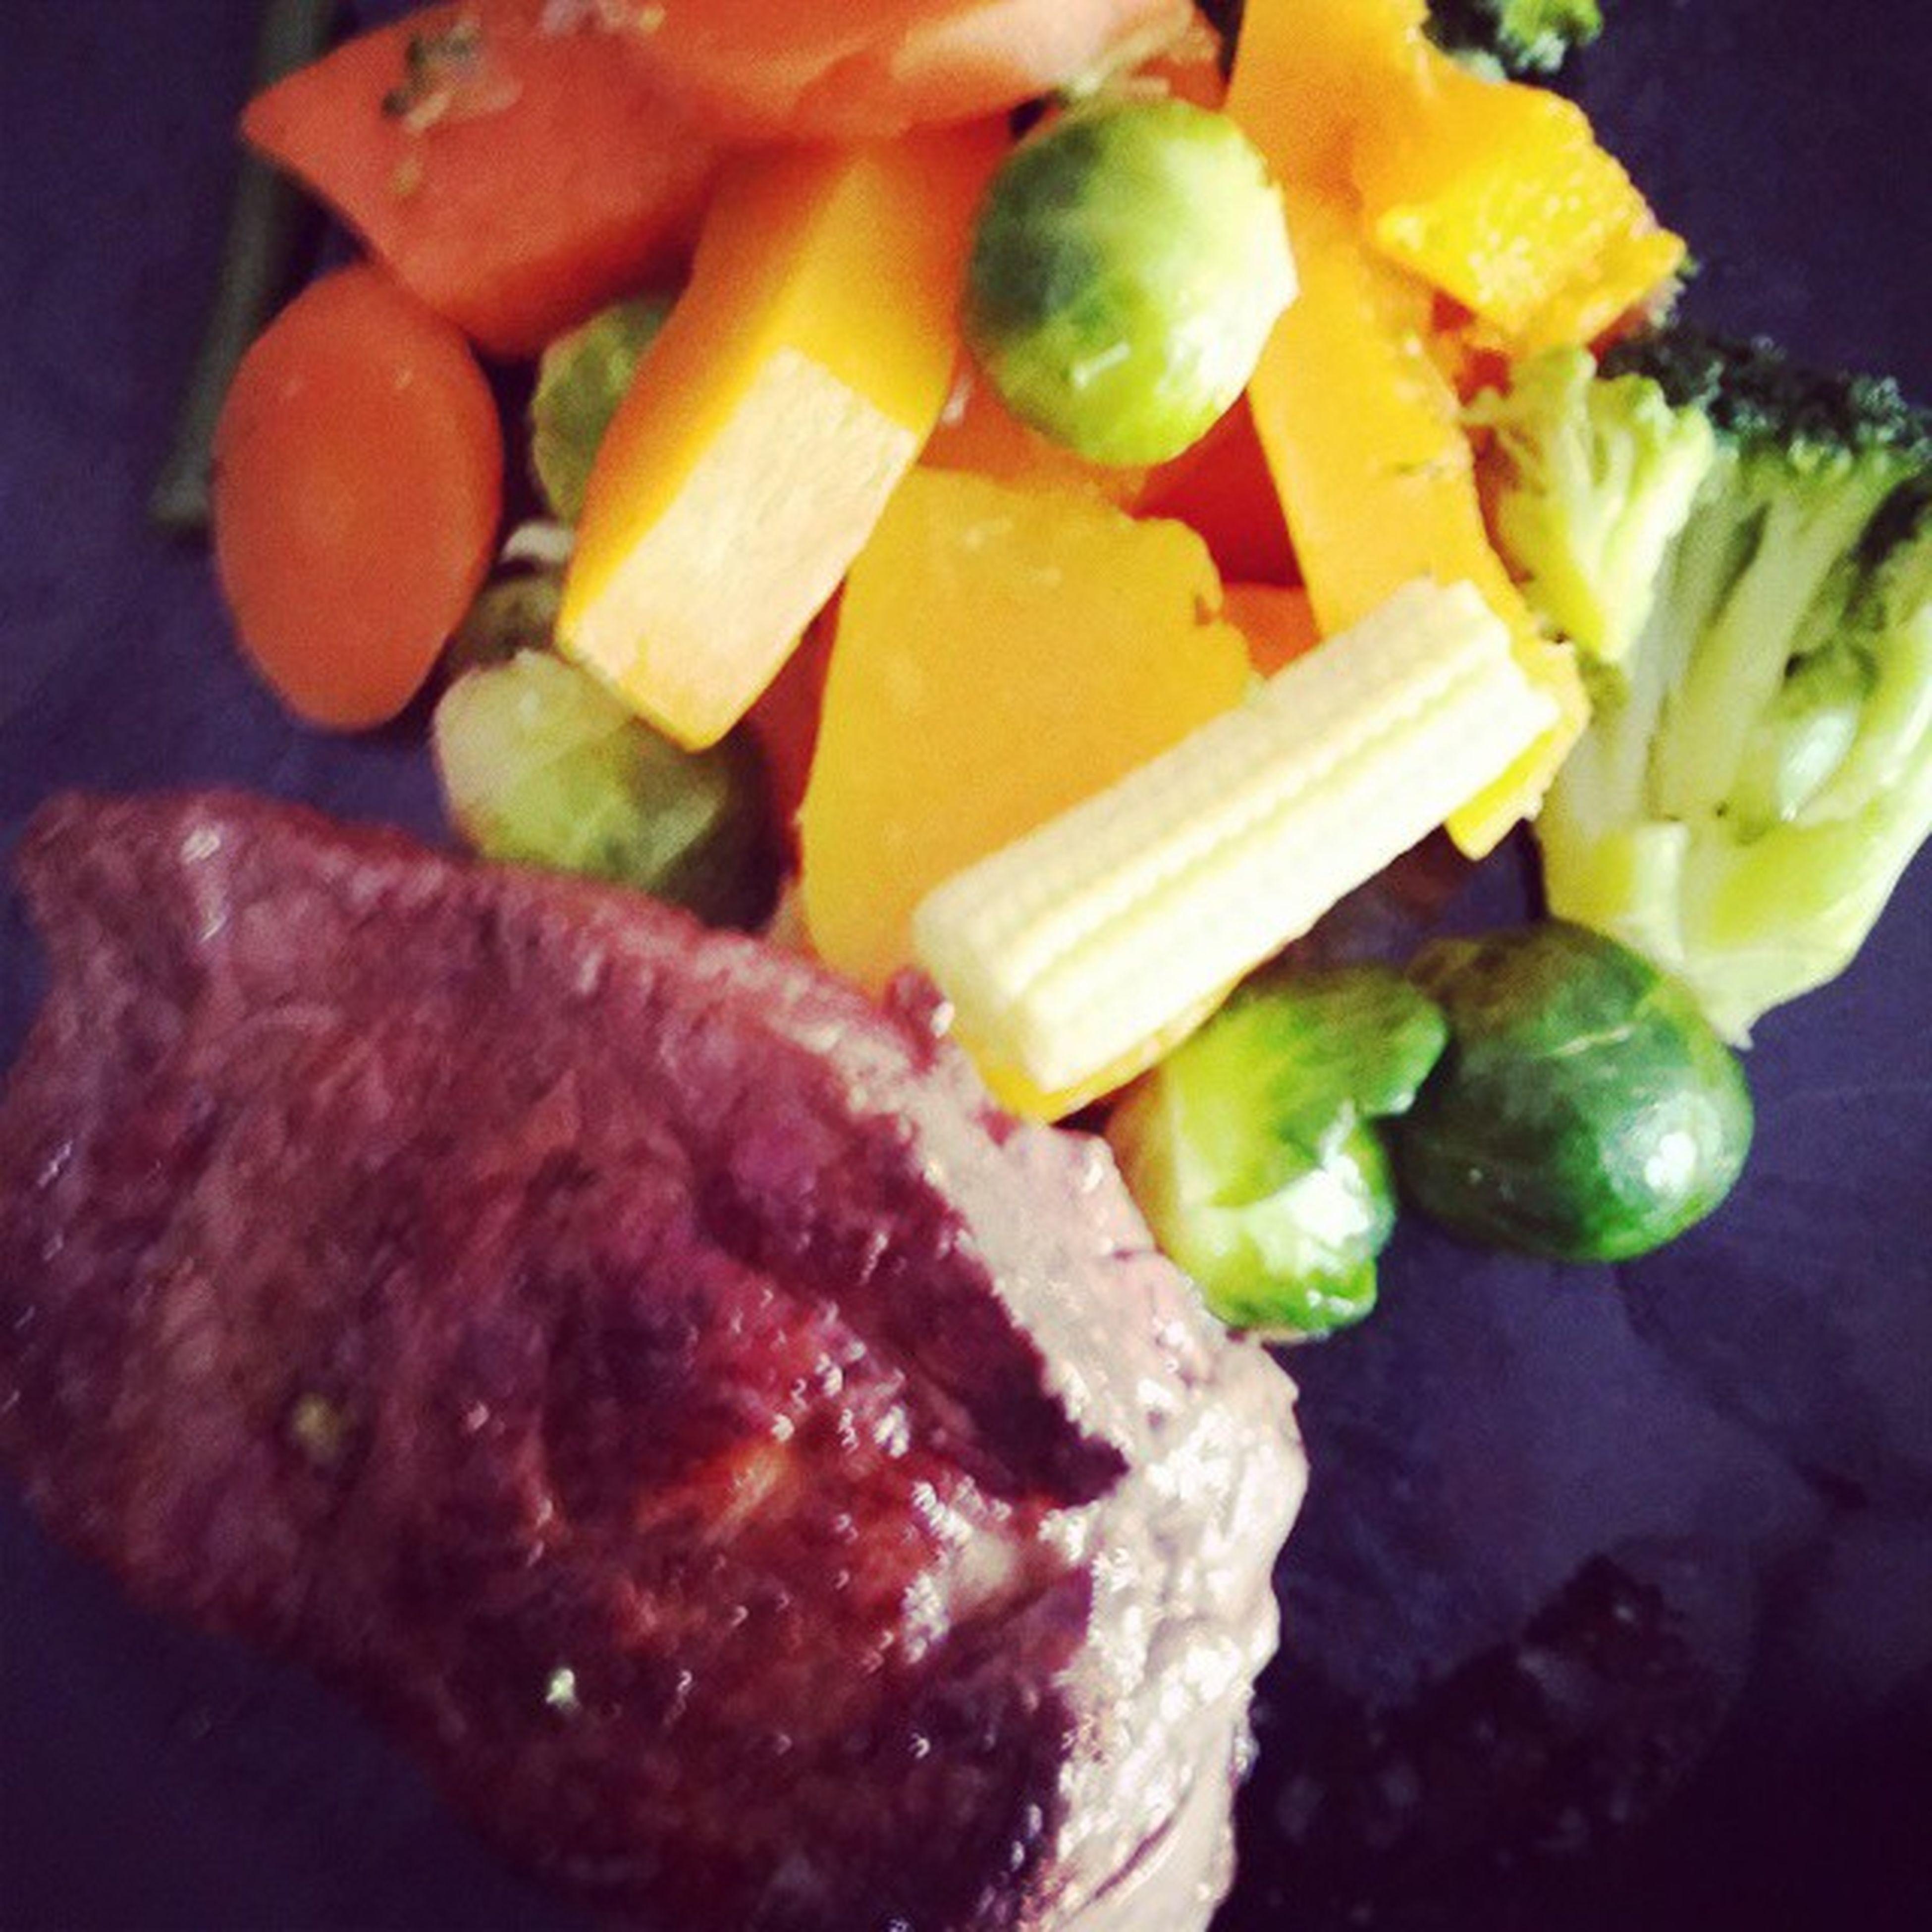 SteakCookedInCoconutOil Sweetpatato Butternutsqaush Broccoli Sprouts Eatclean